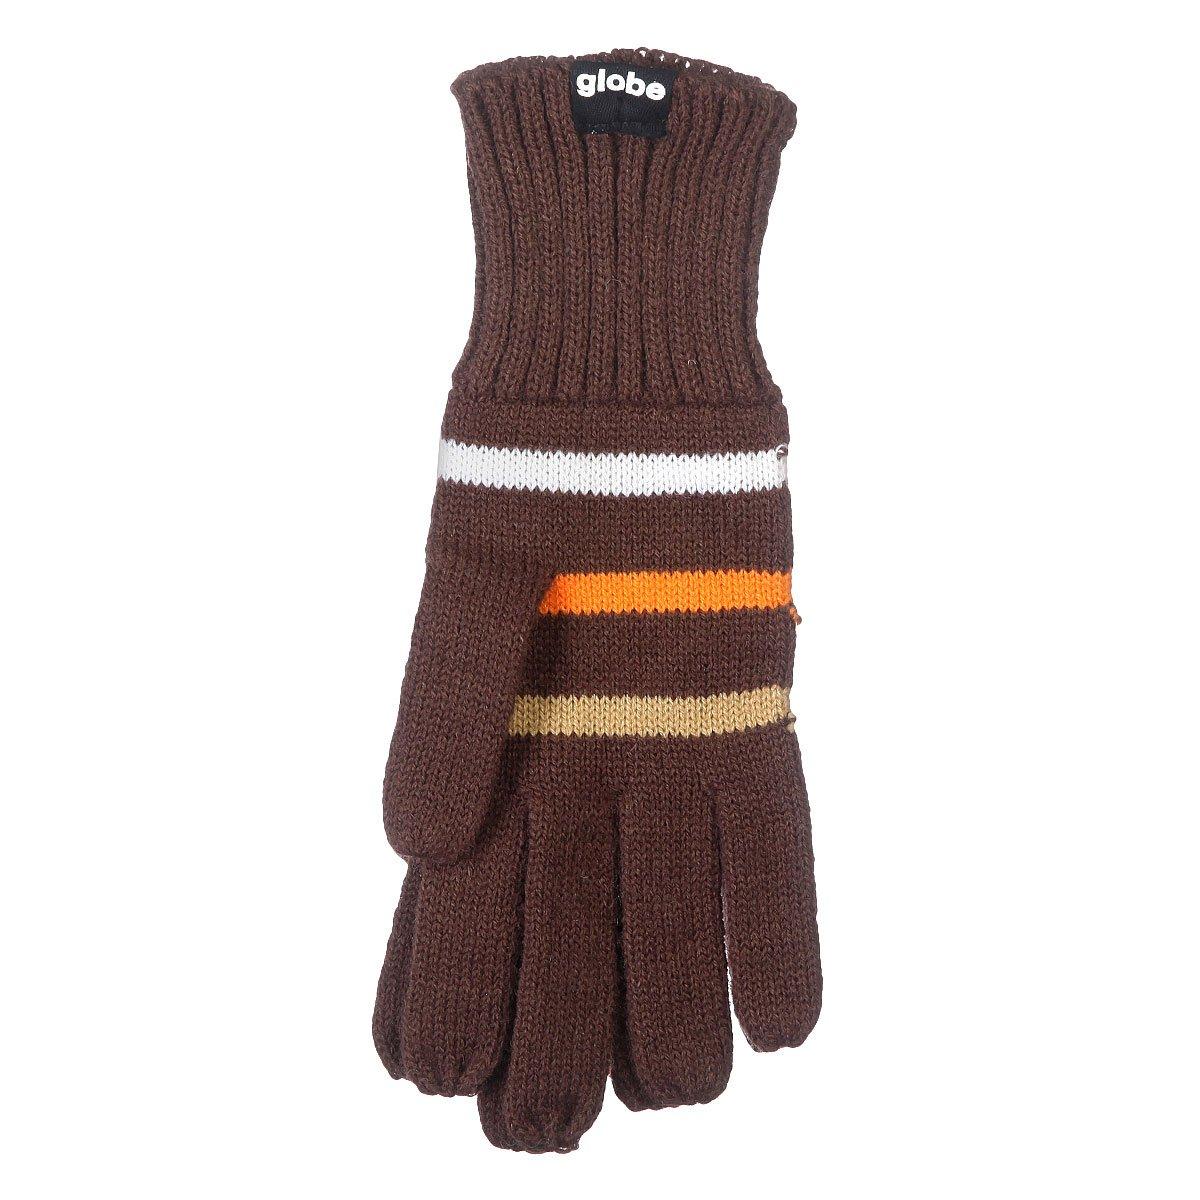 Перчатки Globe Tristripe Gloves Chocolate